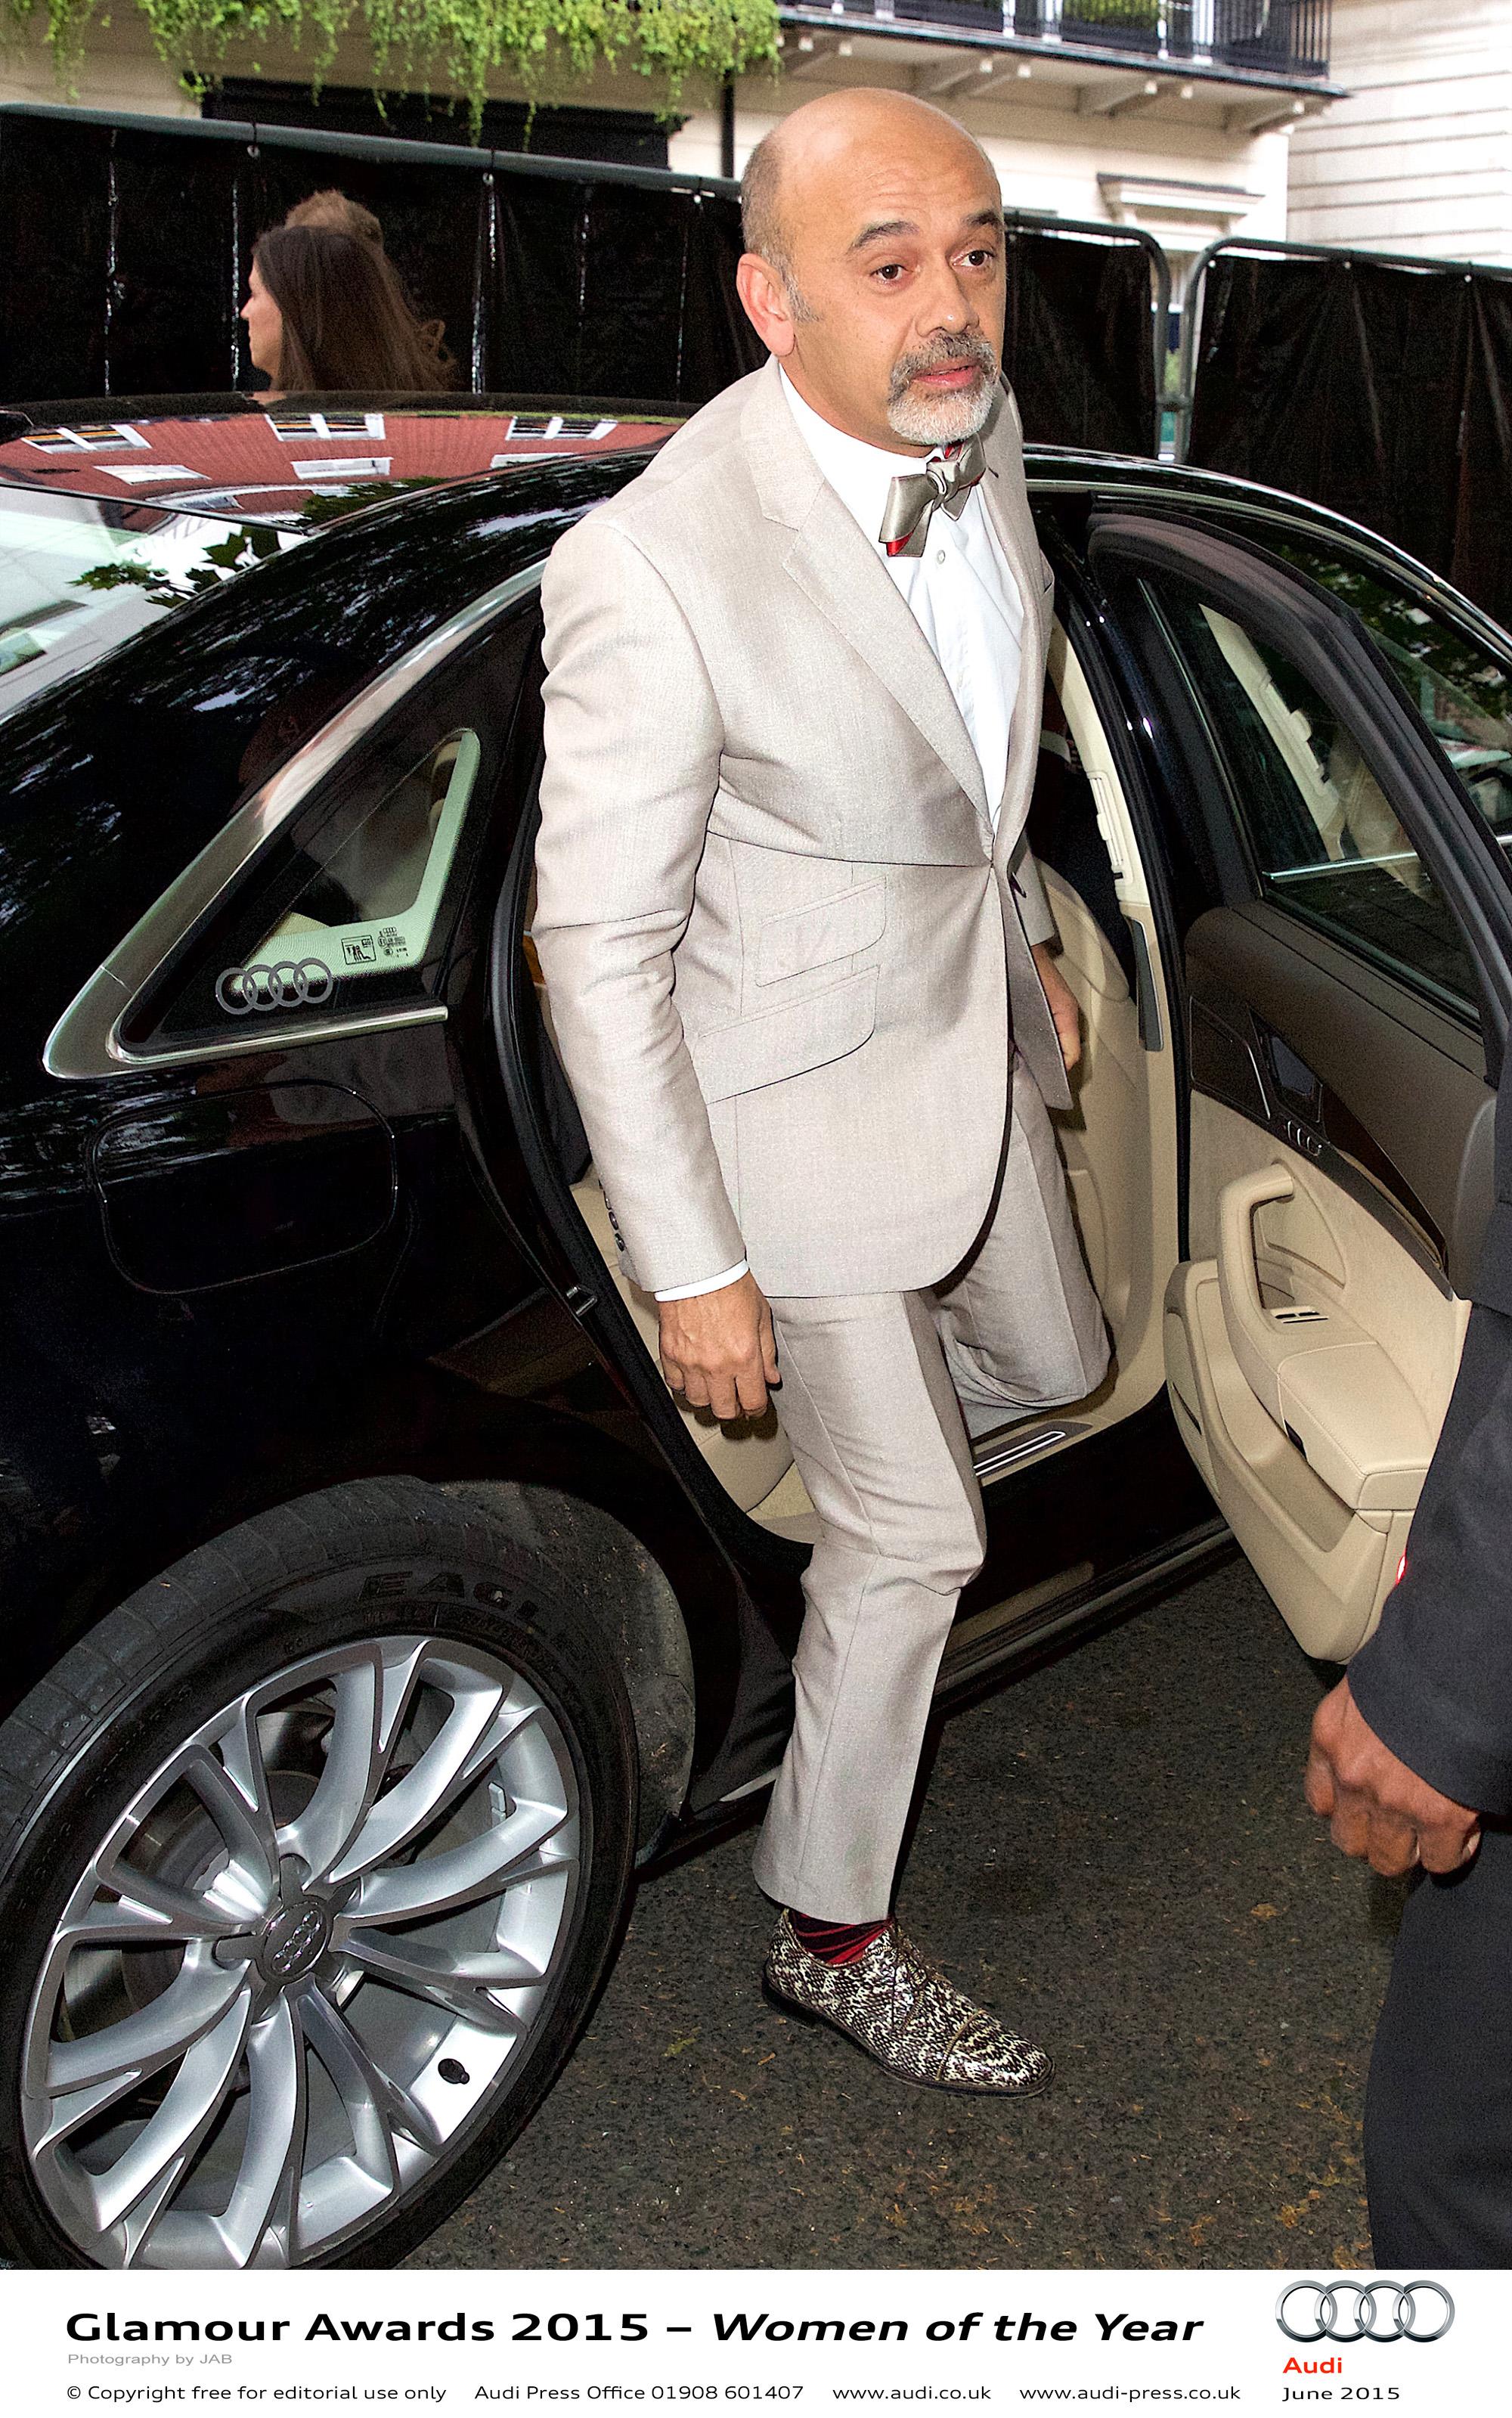 Christian Louboutin - Glamour Awards